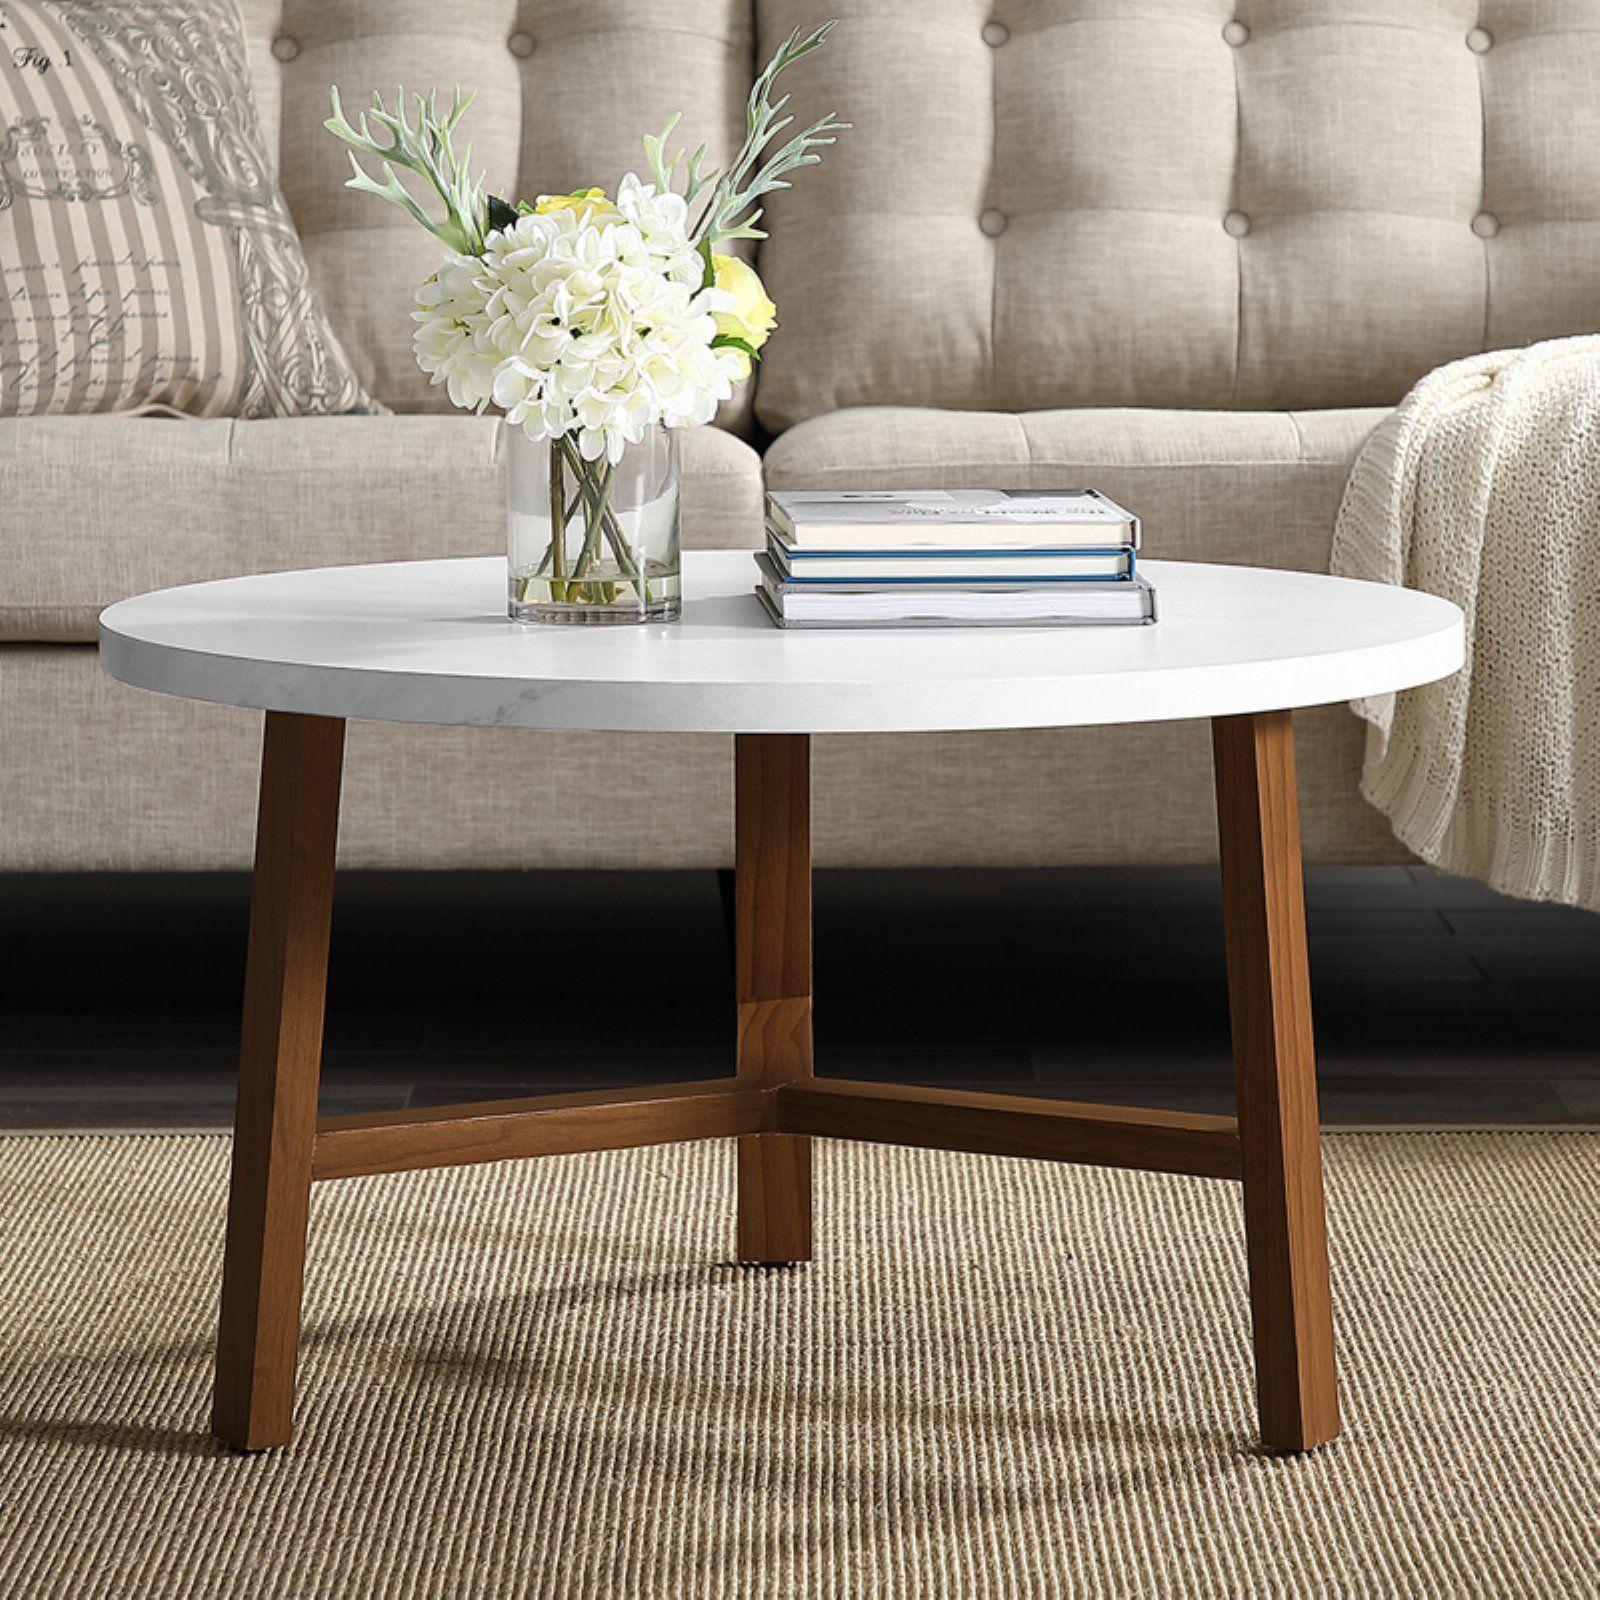 1960s Mid Century Modern Round Walnut Coffee Table For Sale Image 9 Of 9 Round Coffee Table Modern Walnut Coffee Table Modern Round Walnut Coffee Table [ 1600 x 1600 Pixel ]